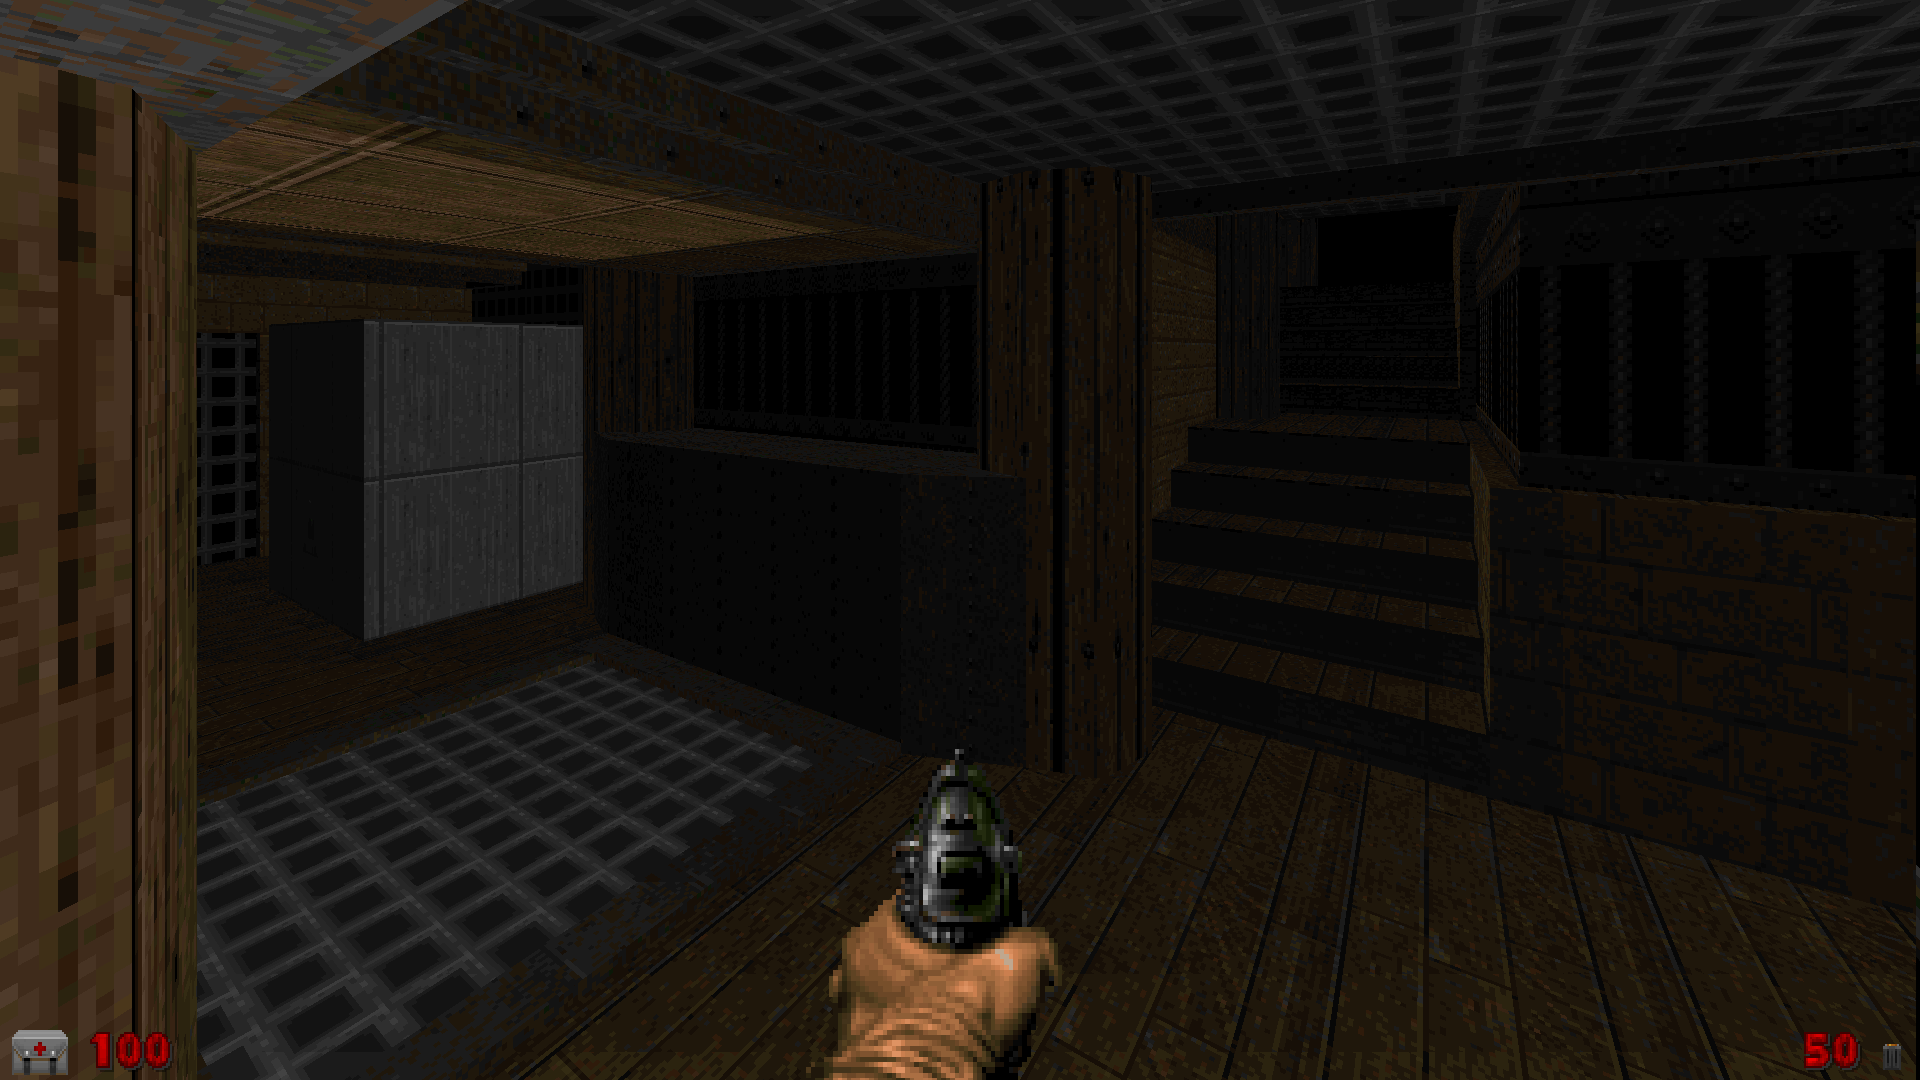 Screenshot_Doom_20200330_185956.png.d378c69252d2b83f4c666b7872fd09d3.png